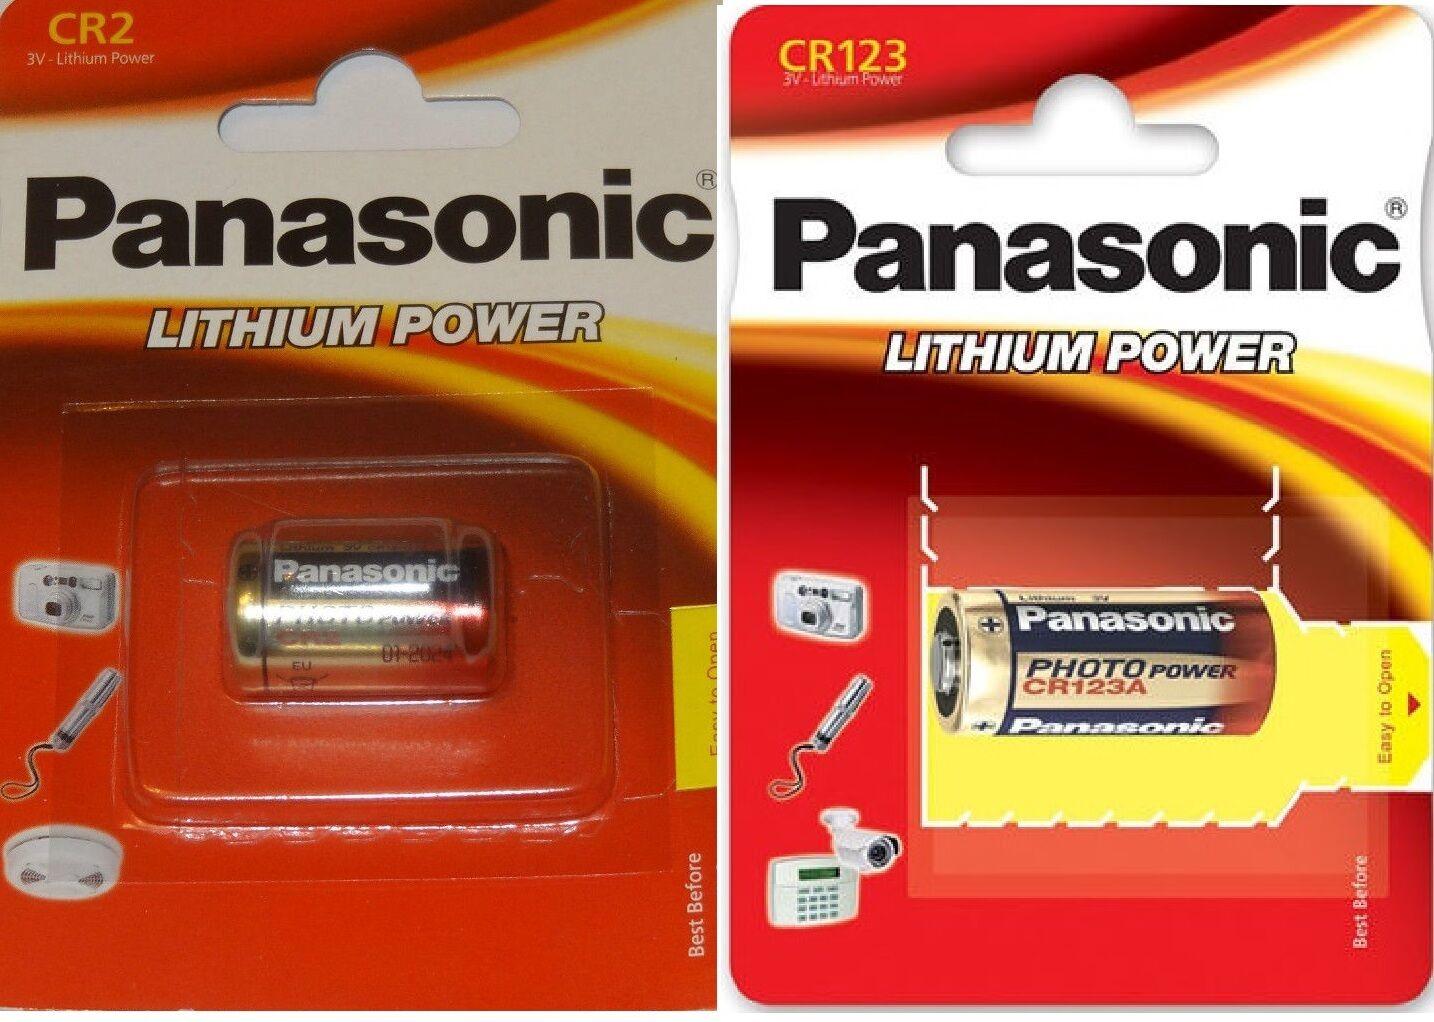 Panasonic Batterie Lithium Photo-Power CR123A CR2 3V CR123 A CR2